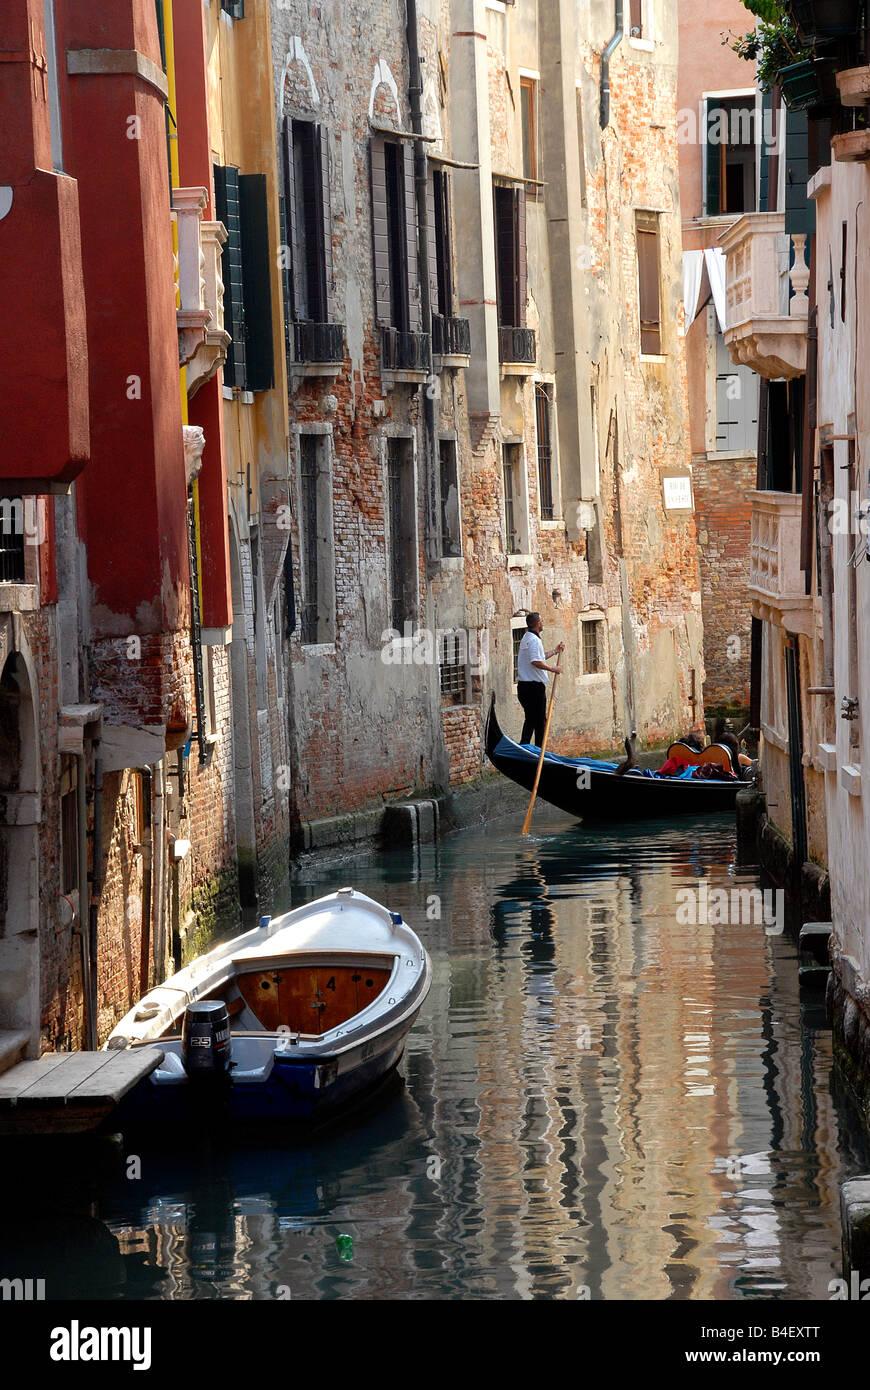 Gondola in small canal Venice Italy - Stock Image